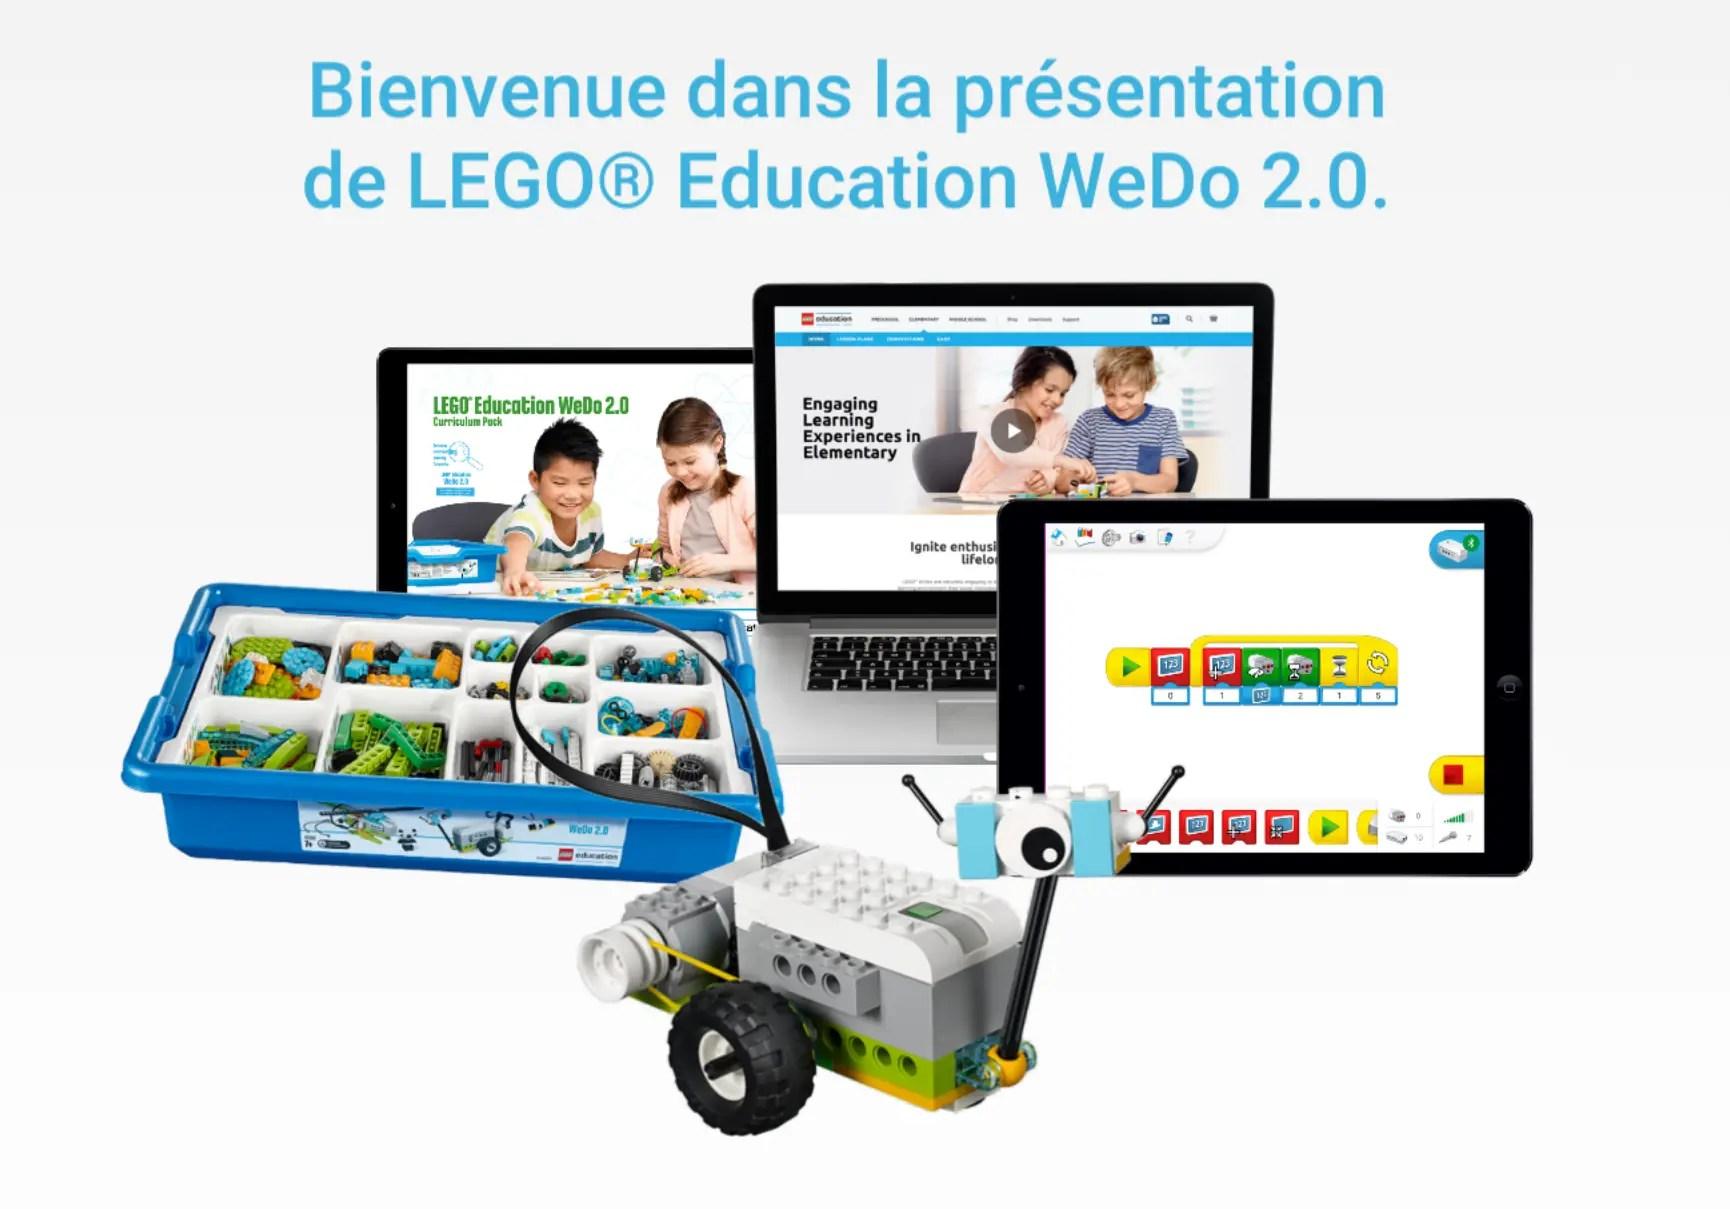 lego education wedo 2 0 l 39 application qui offre les bases du codage informatique sur chromebook. Black Bedroom Furniture Sets. Home Design Ideas